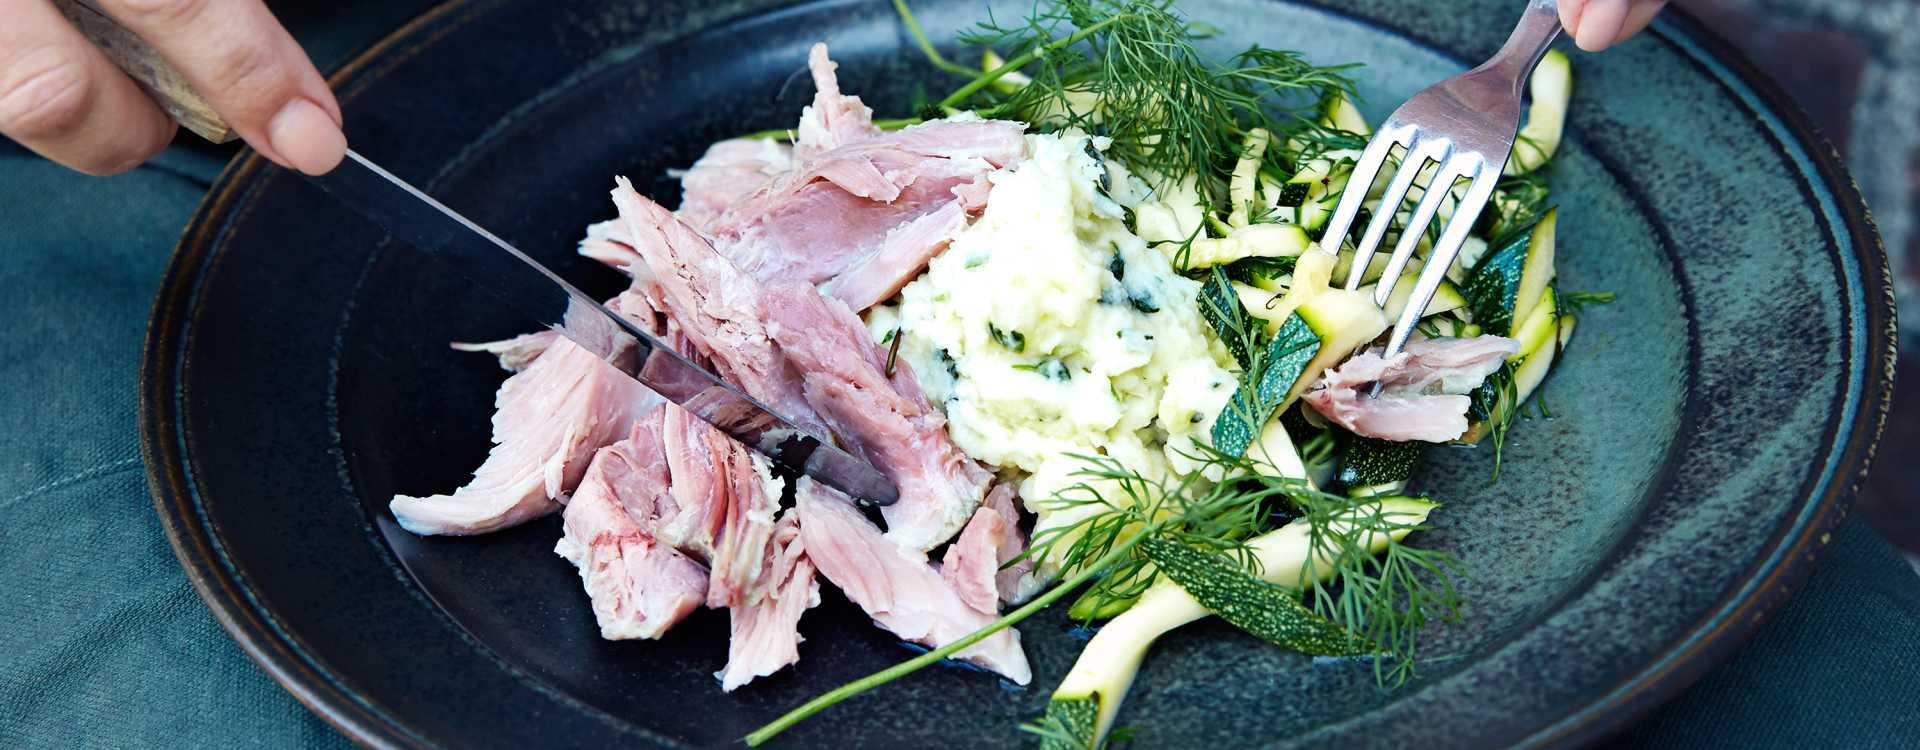 Kokt svineknoke med syltet squash og potetmos med urter